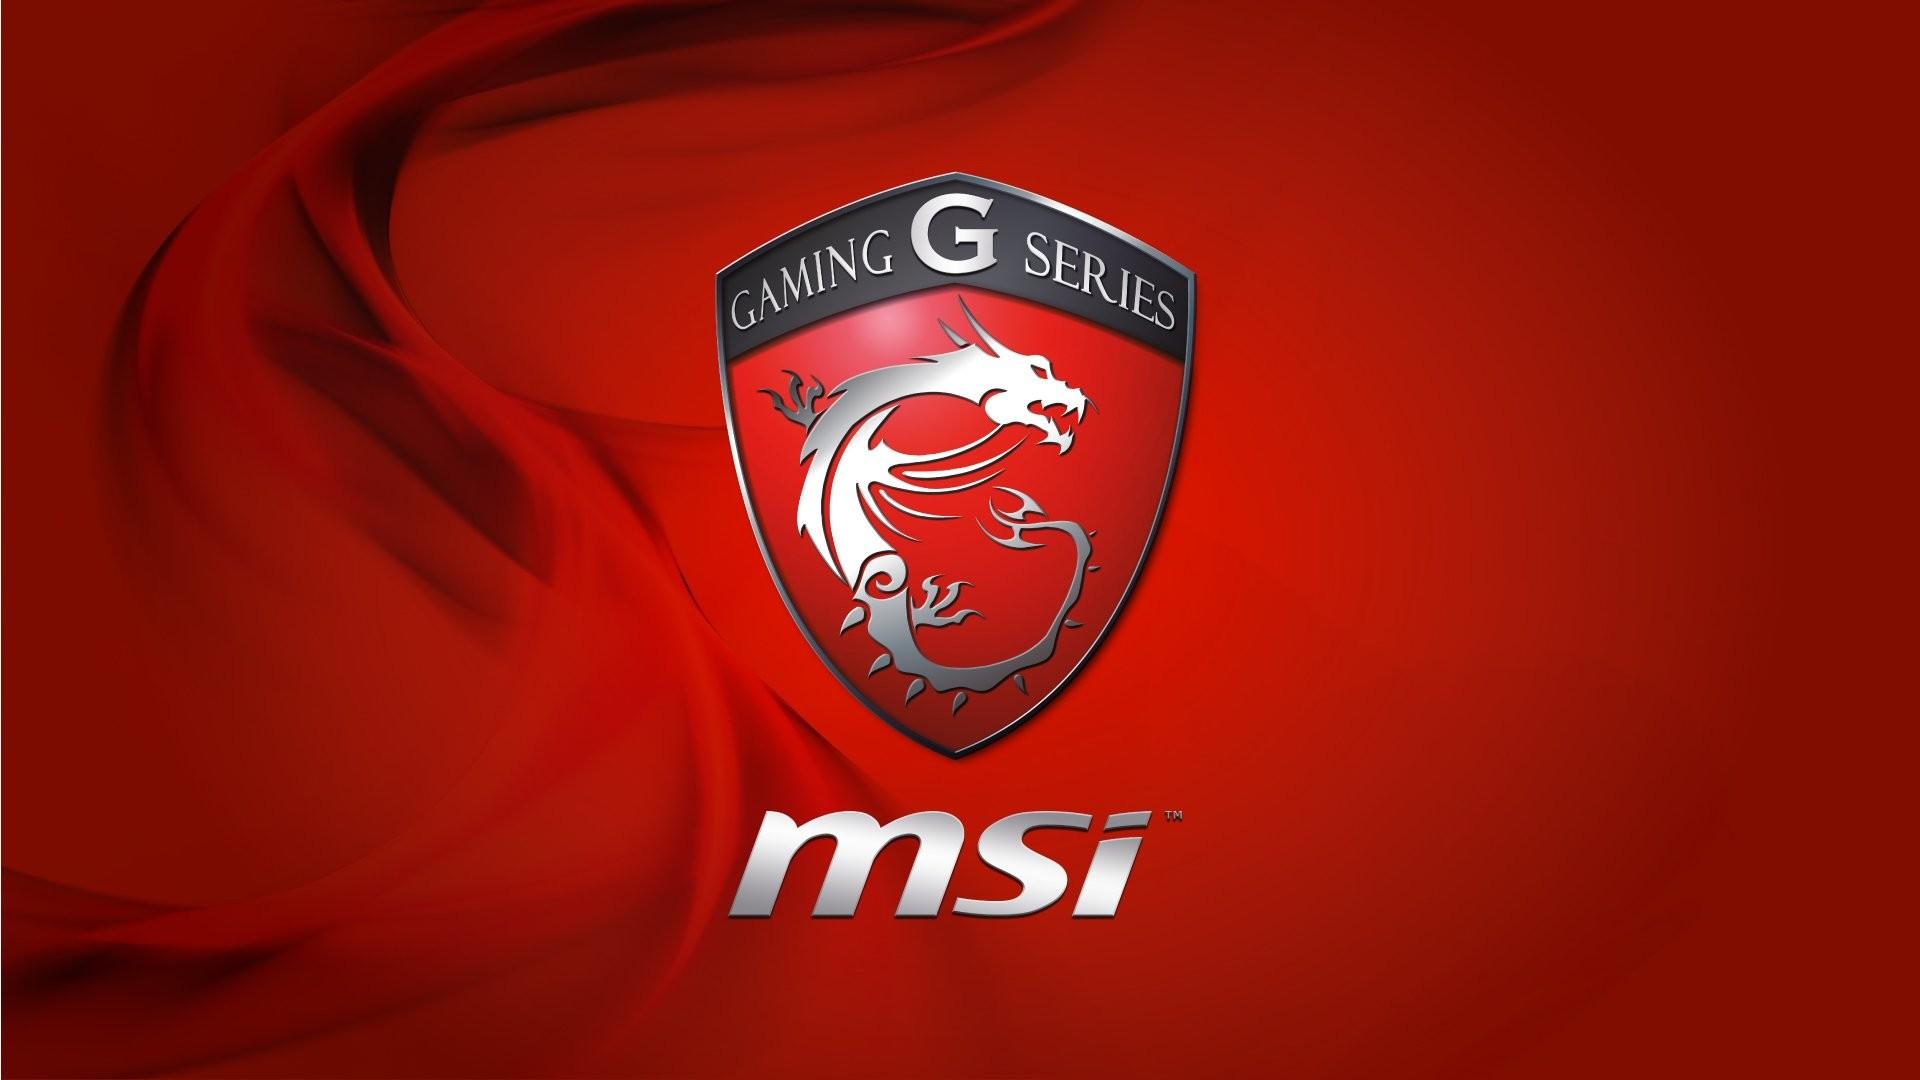 MSI Full HD Wallpaper